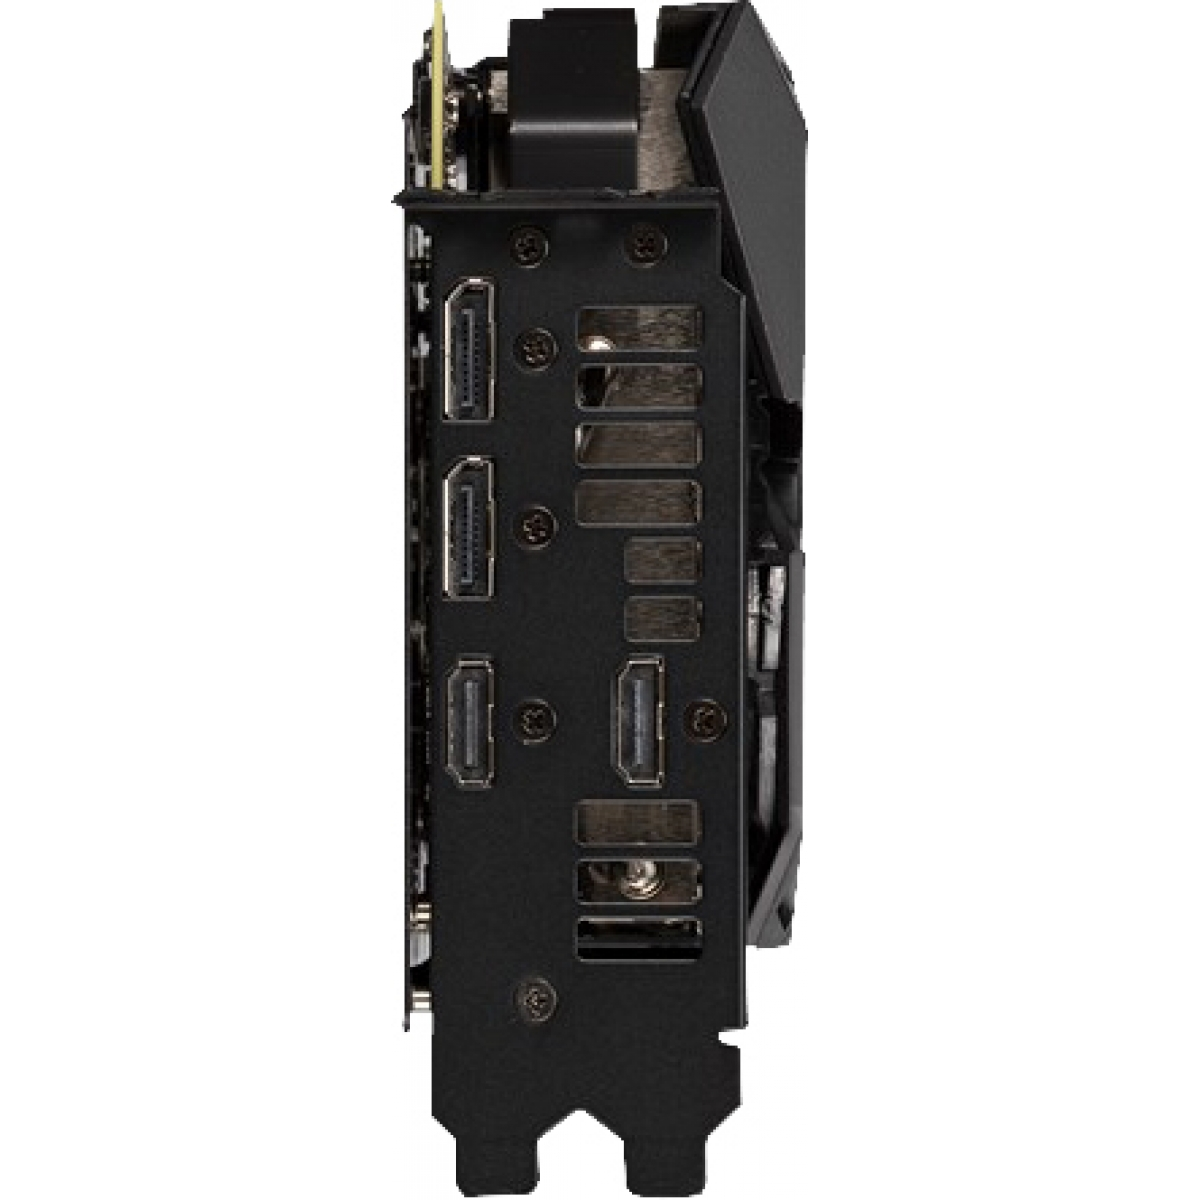 Placa de Vídeo Asus GeForce RTX 2060 Rog Strix Gaming Oc Edition, 6GB GDDR6, 192Bit, ROG-STRIX-RTX2060-O6G-GAMING